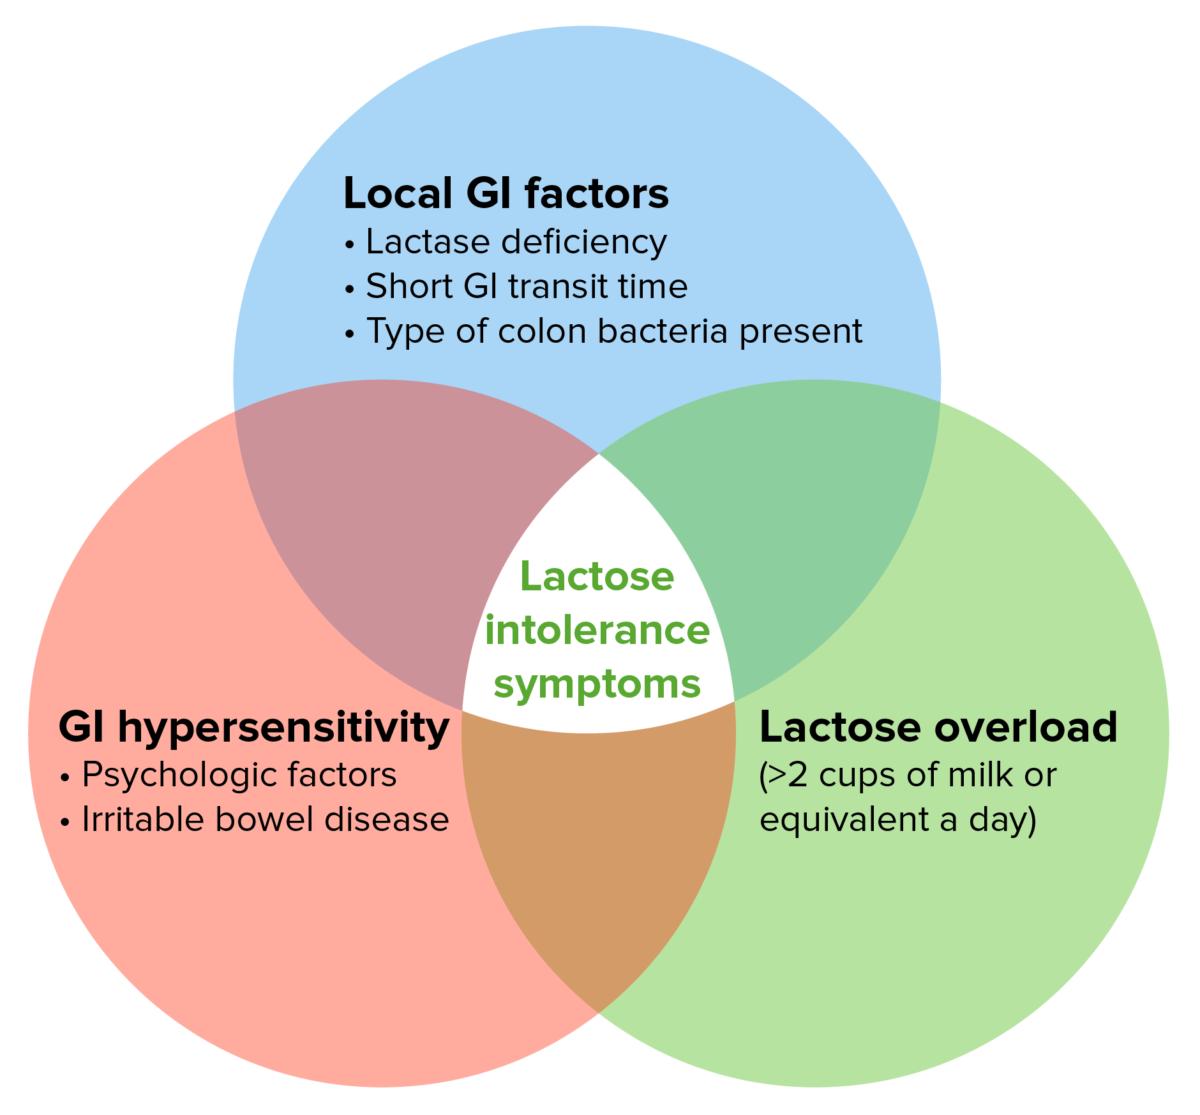 Pathogenesis of Lactose Intolerance Symptoms